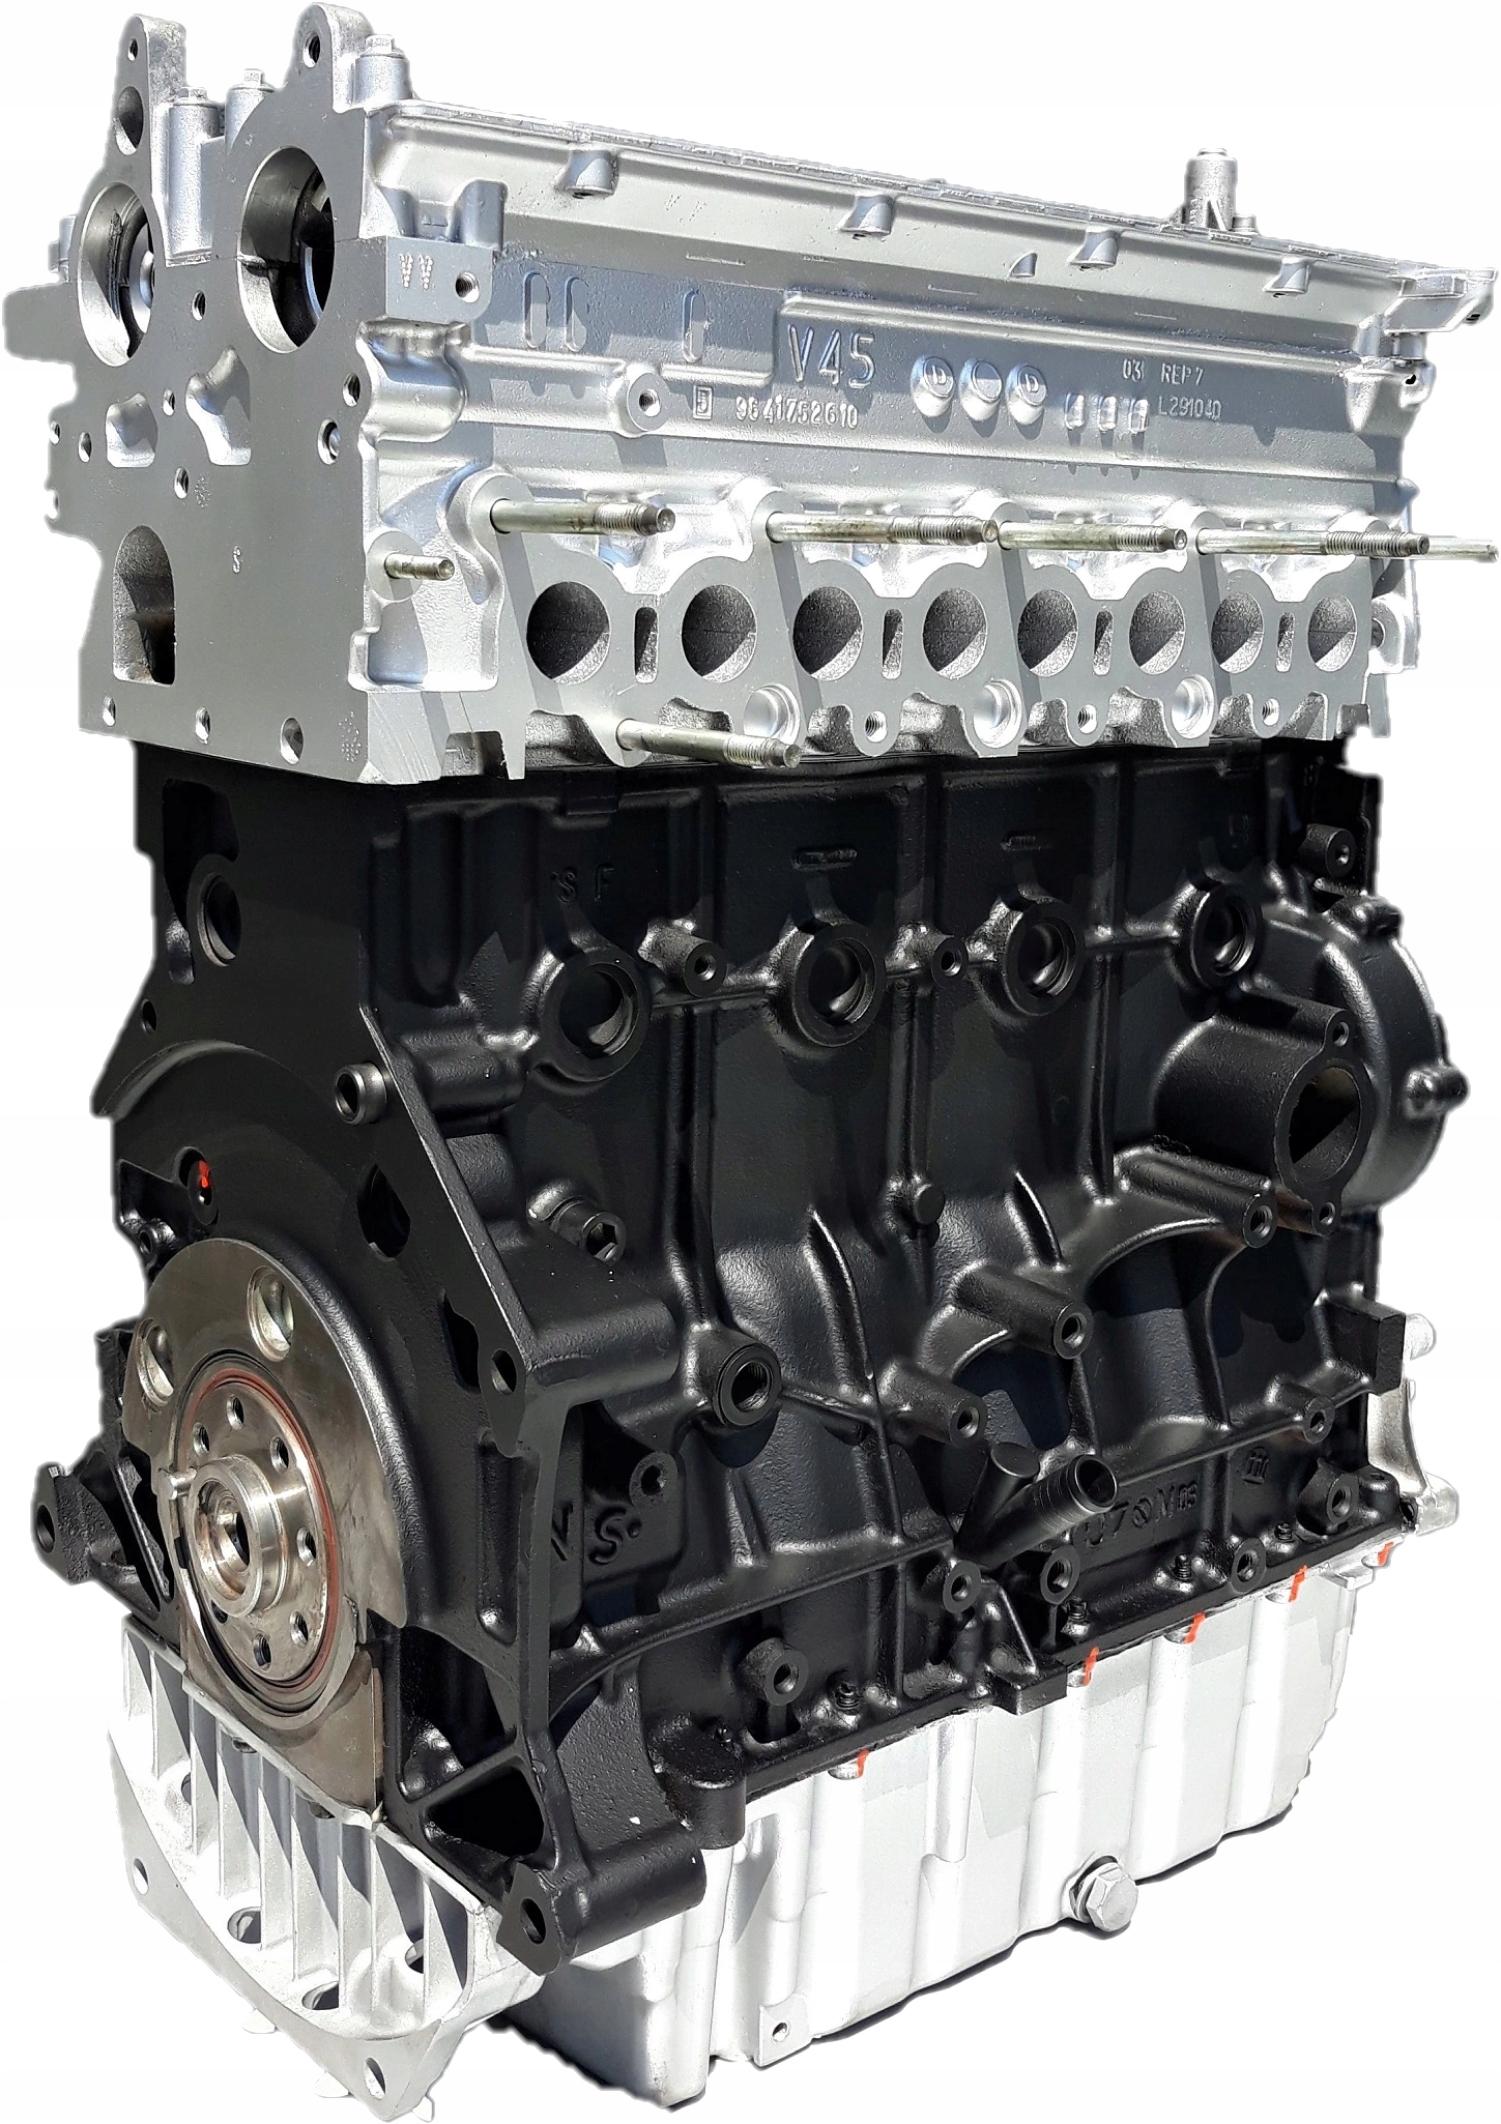 двигатель ford galaxy 20 tdci 16v d4204t гарантия